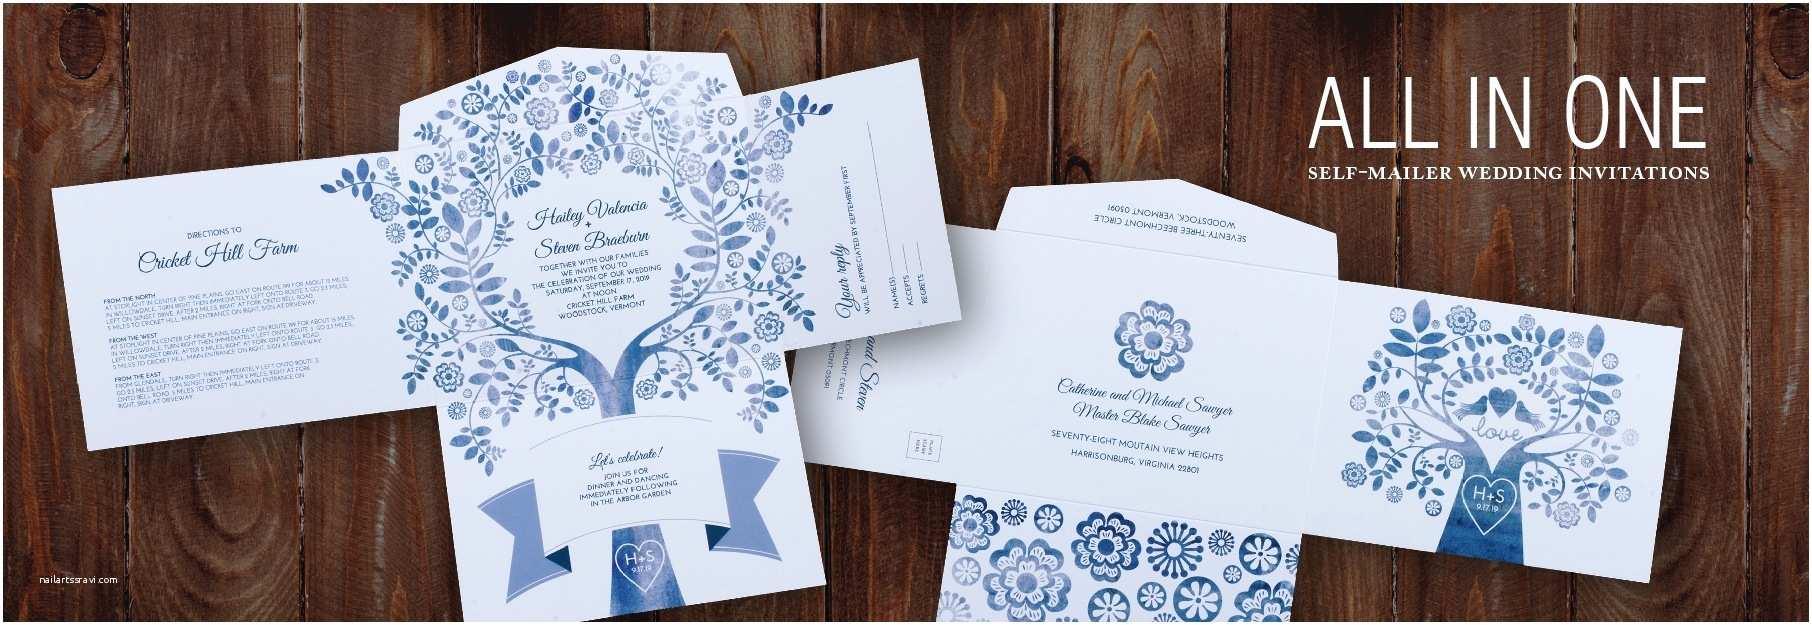 All In One Wedding Invitations All In E Wedding Invitations